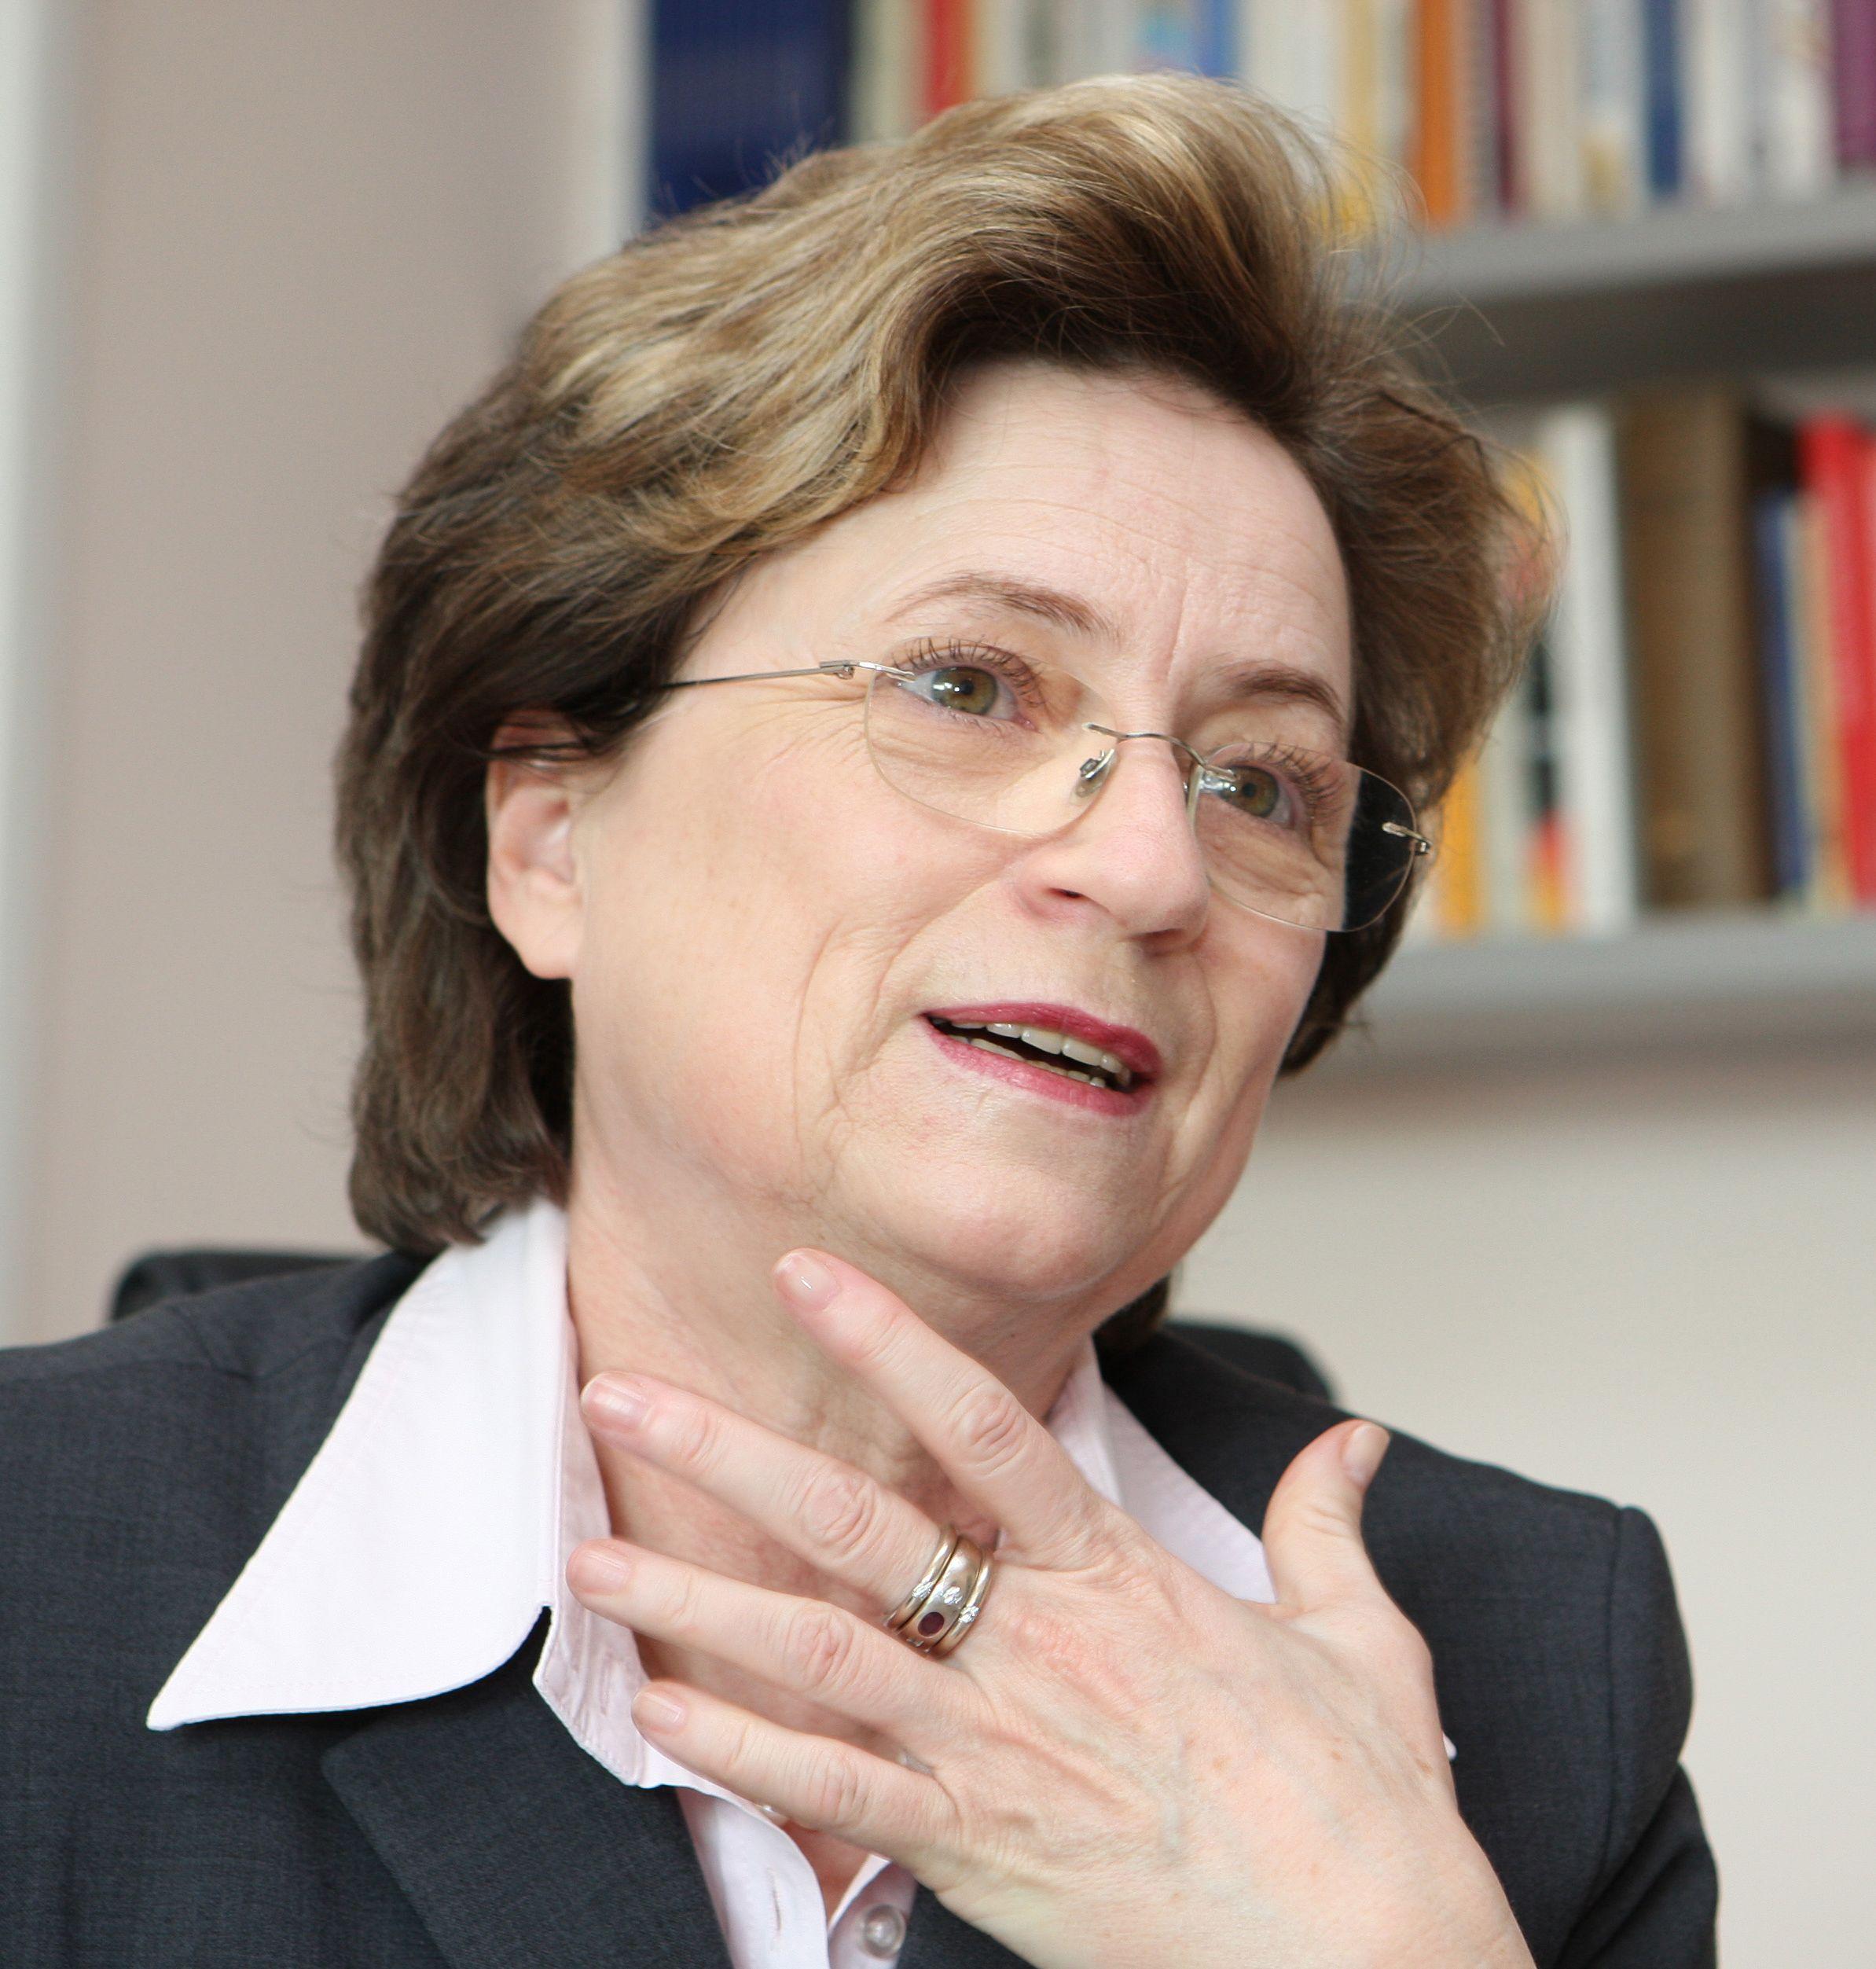 Christine Bauer-Jelinek (c) Privat